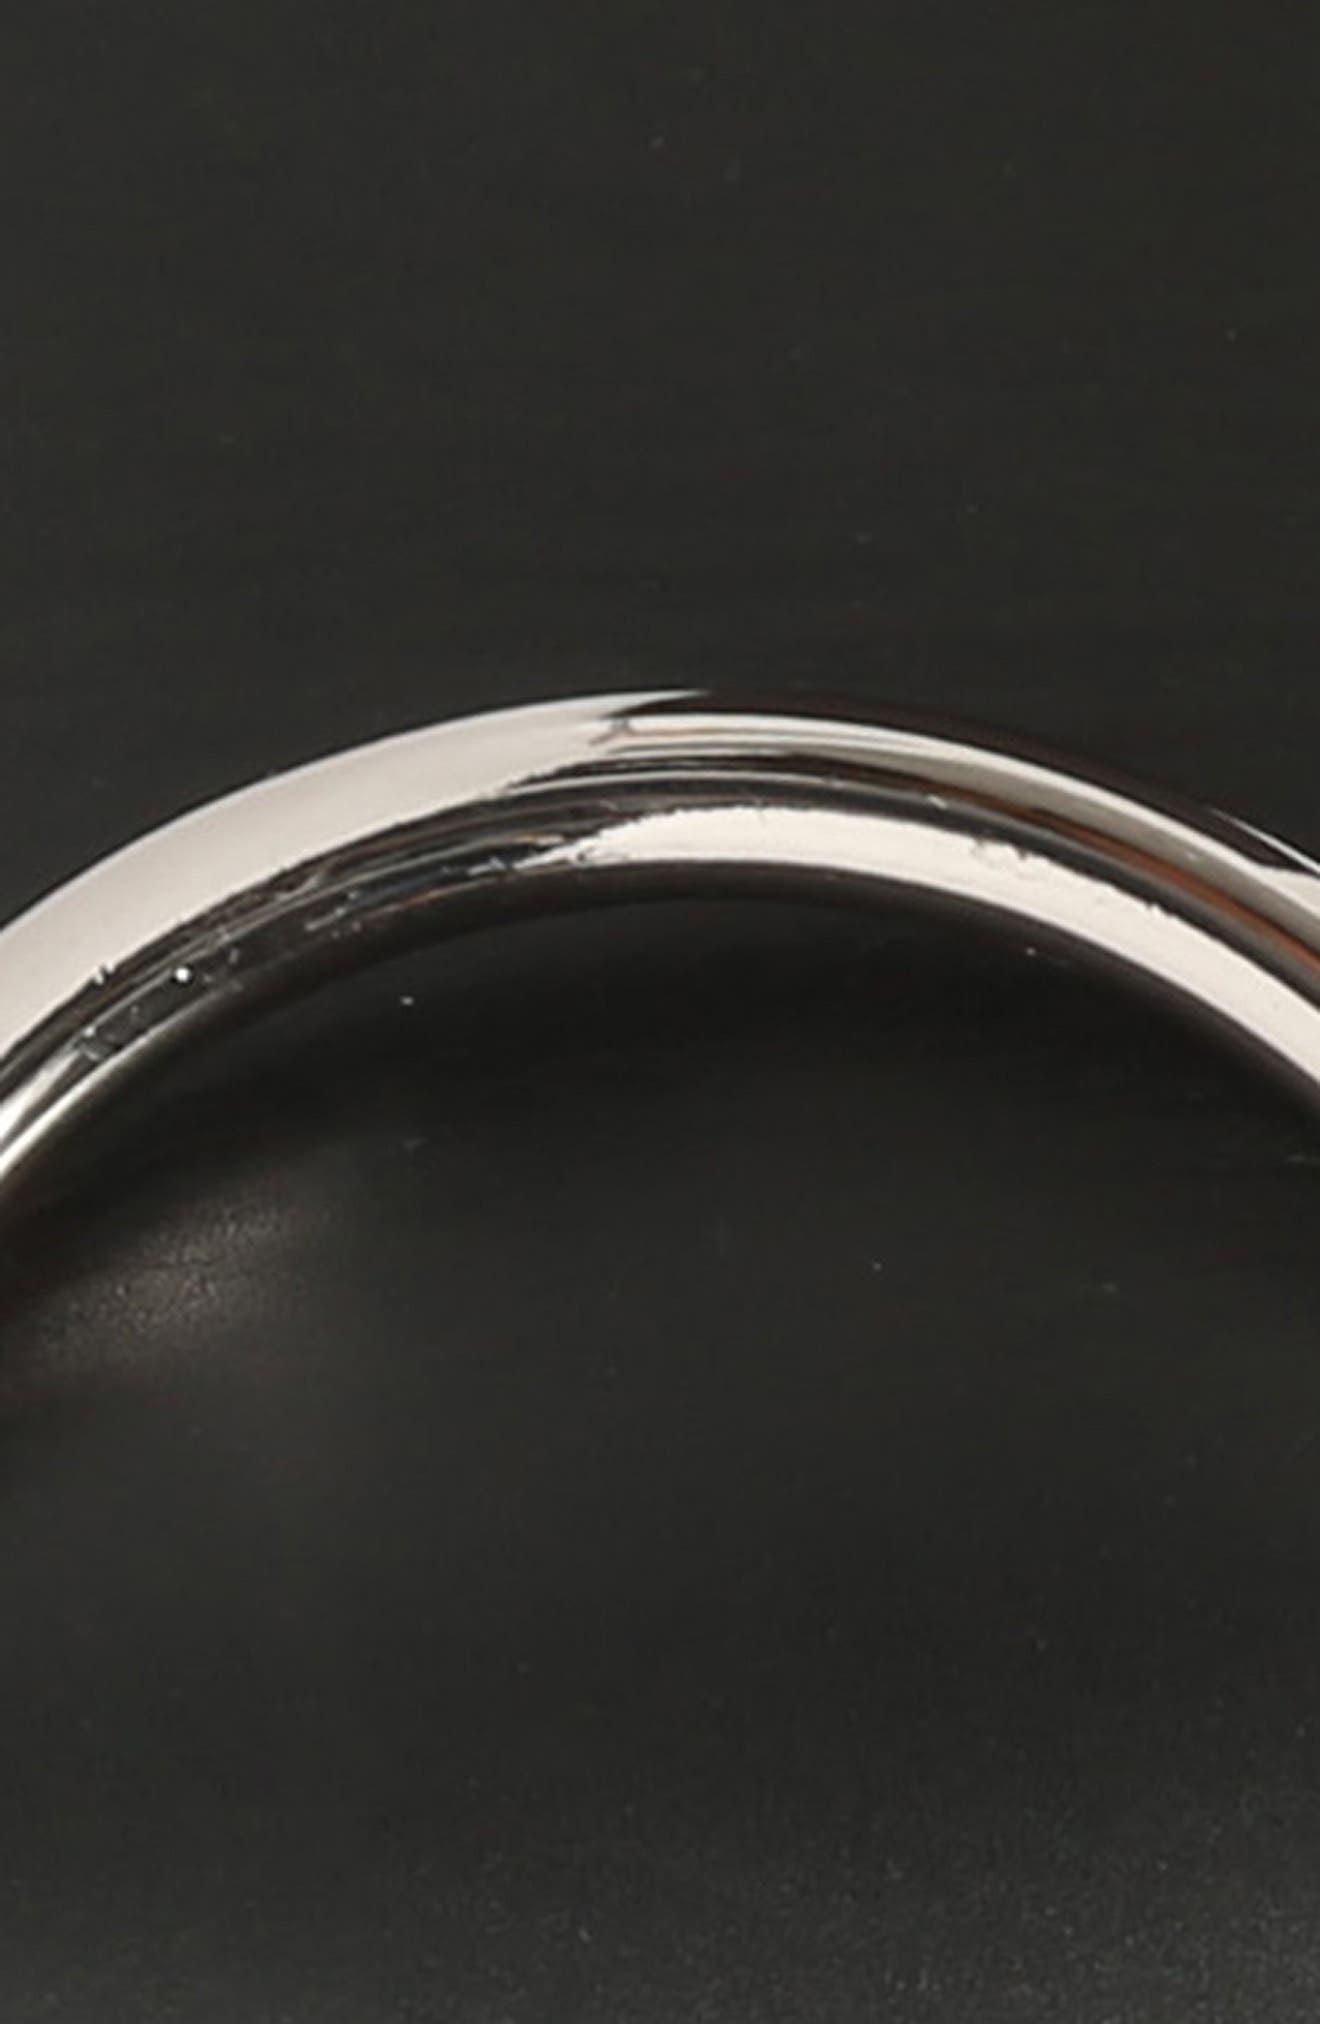 MAX MARA, Curt Circle Buckle Leather Belt, Alternate thumbnail 4, color, 001